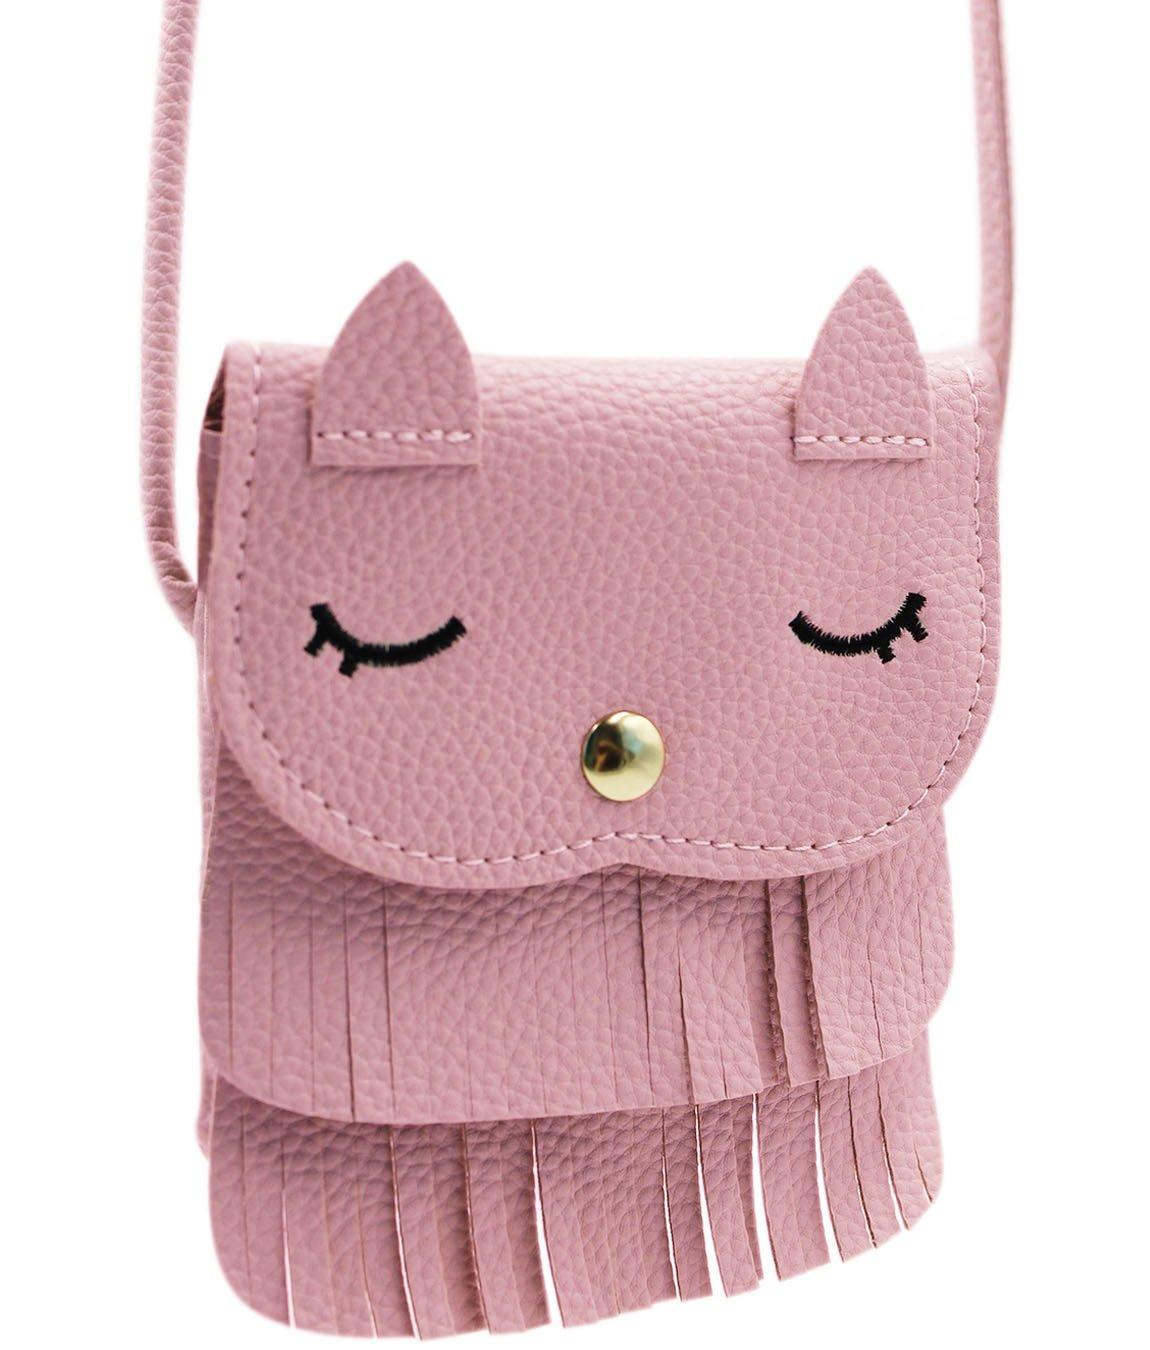 Amamcy Cat Tassel Coin Purse Shoulder Bag PU Leather Purse Mini Crossbody Satchel Handbags for Toddler Kids Girls